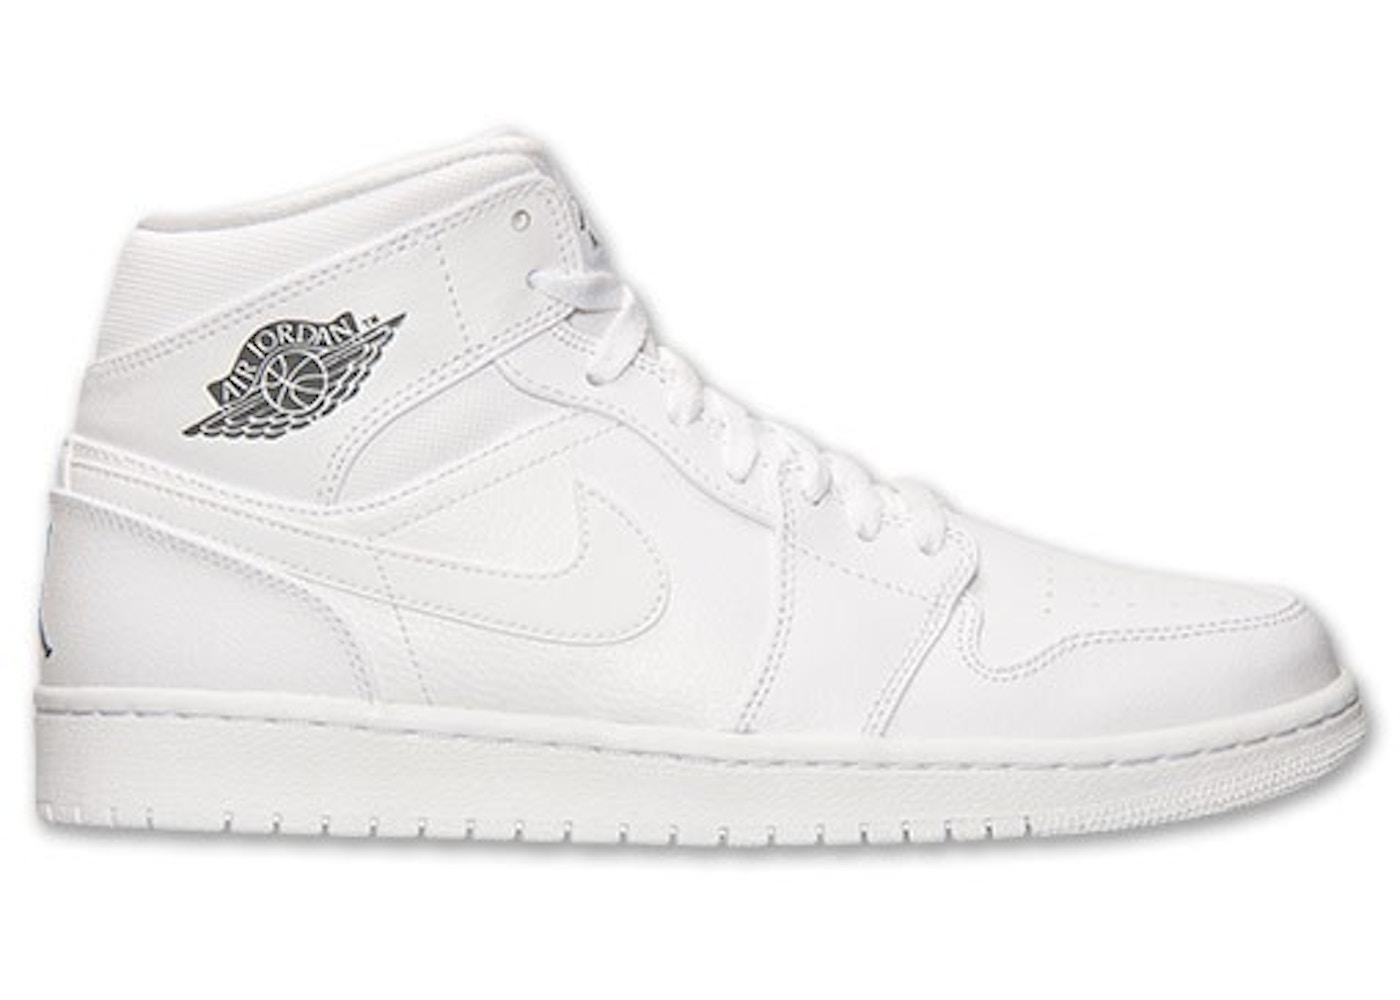 d76512f76a0f Jordan 1 Retro Mid White Cool Grey - 554724-102